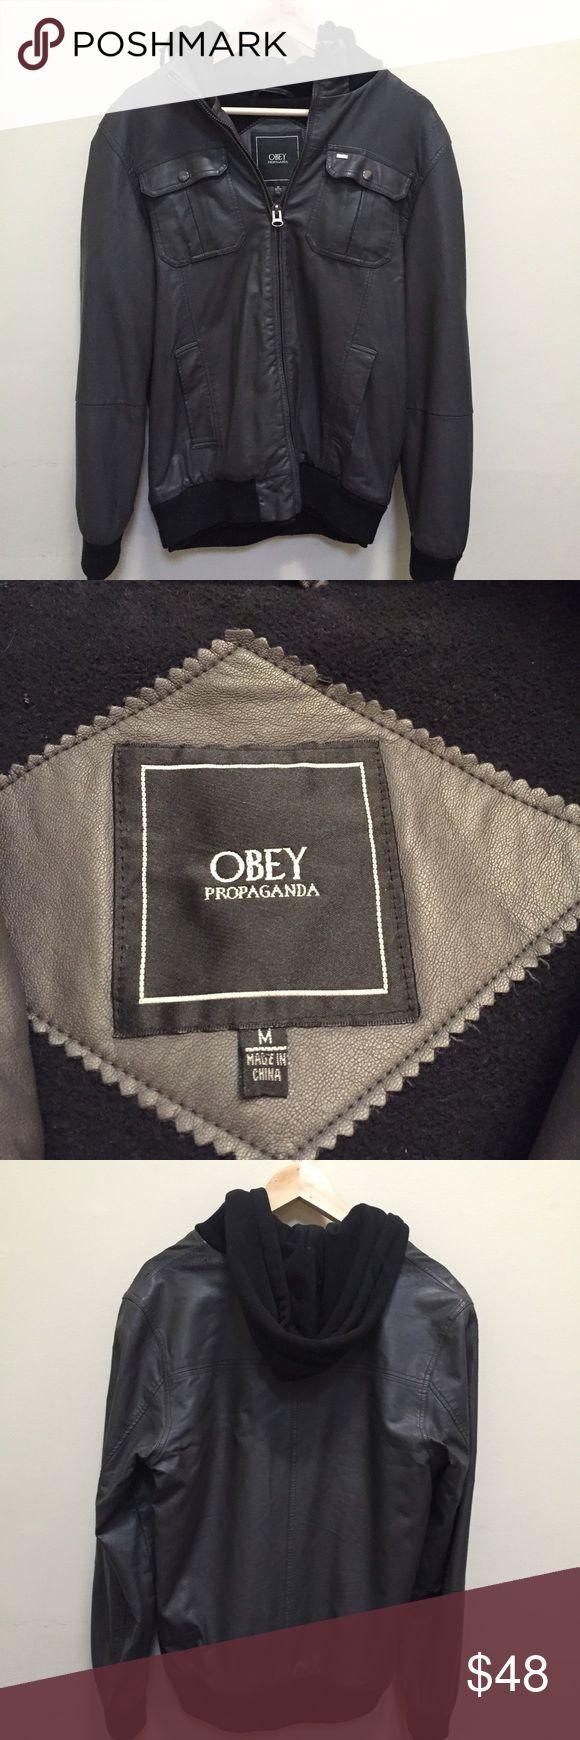 Mens jacket lazada - Obey Propaganda Faux Hoodie Leather Jacket Obey Propaganda Faux Hoodie Leather Jacket Hipster Jacket Purchased